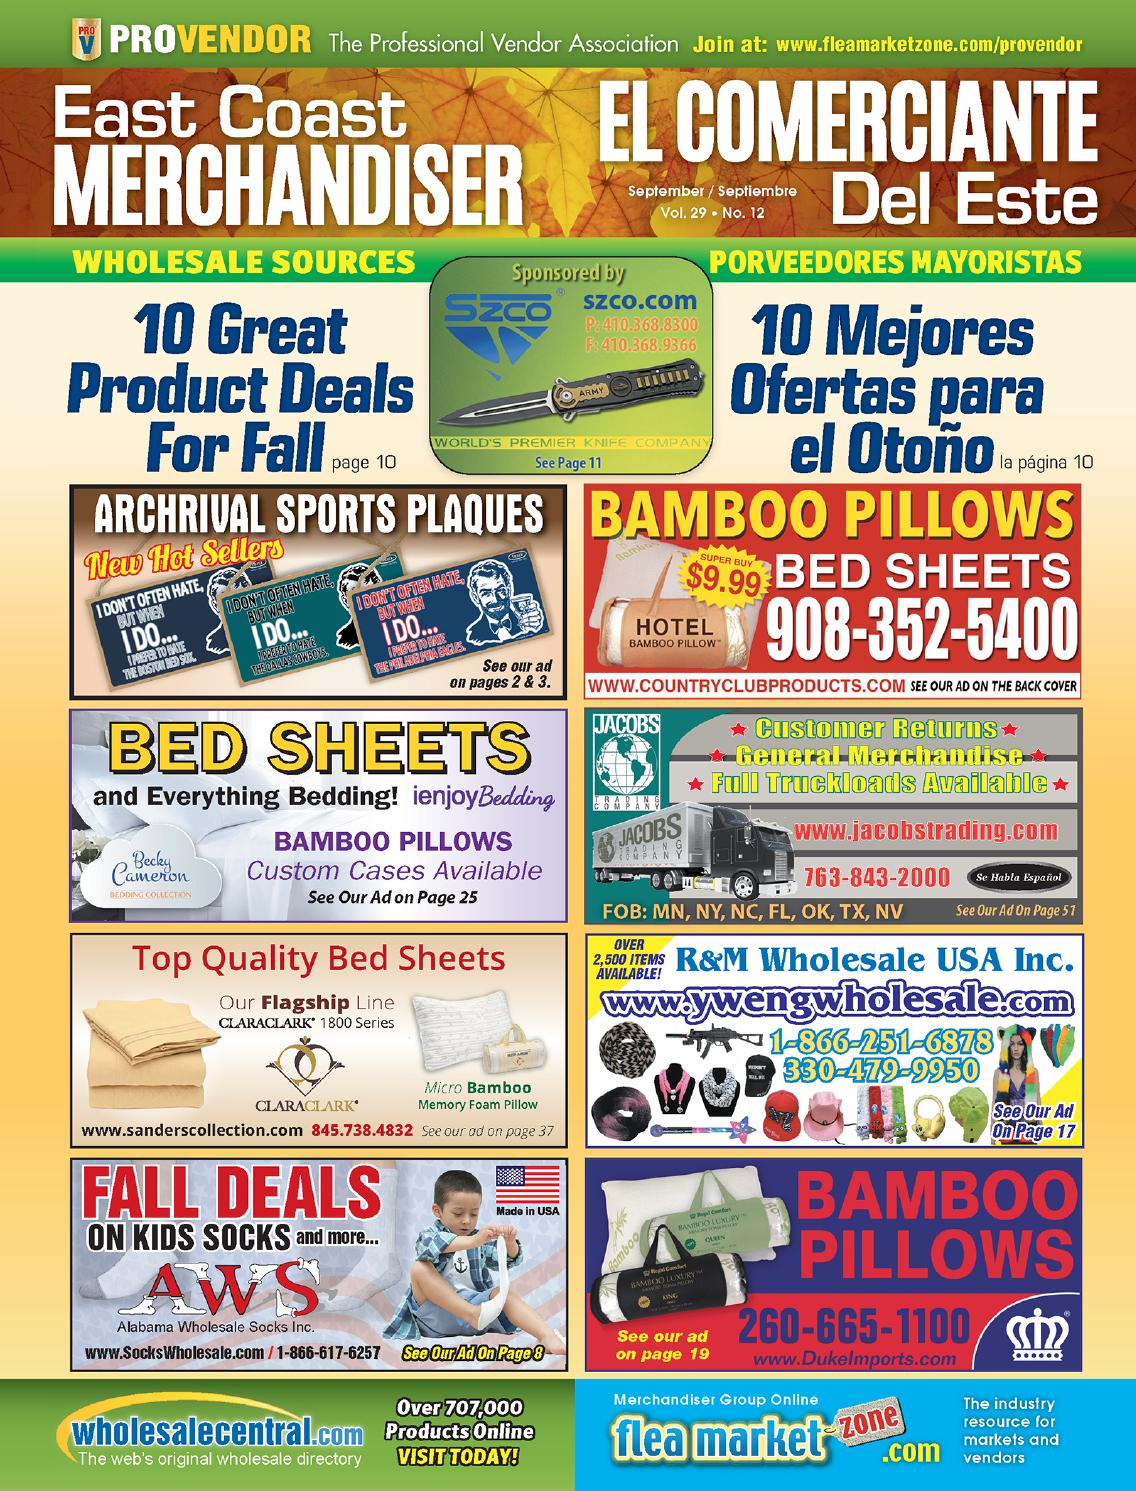 East Coast Merchandiser 09-14 by Sumner Communications - issuu